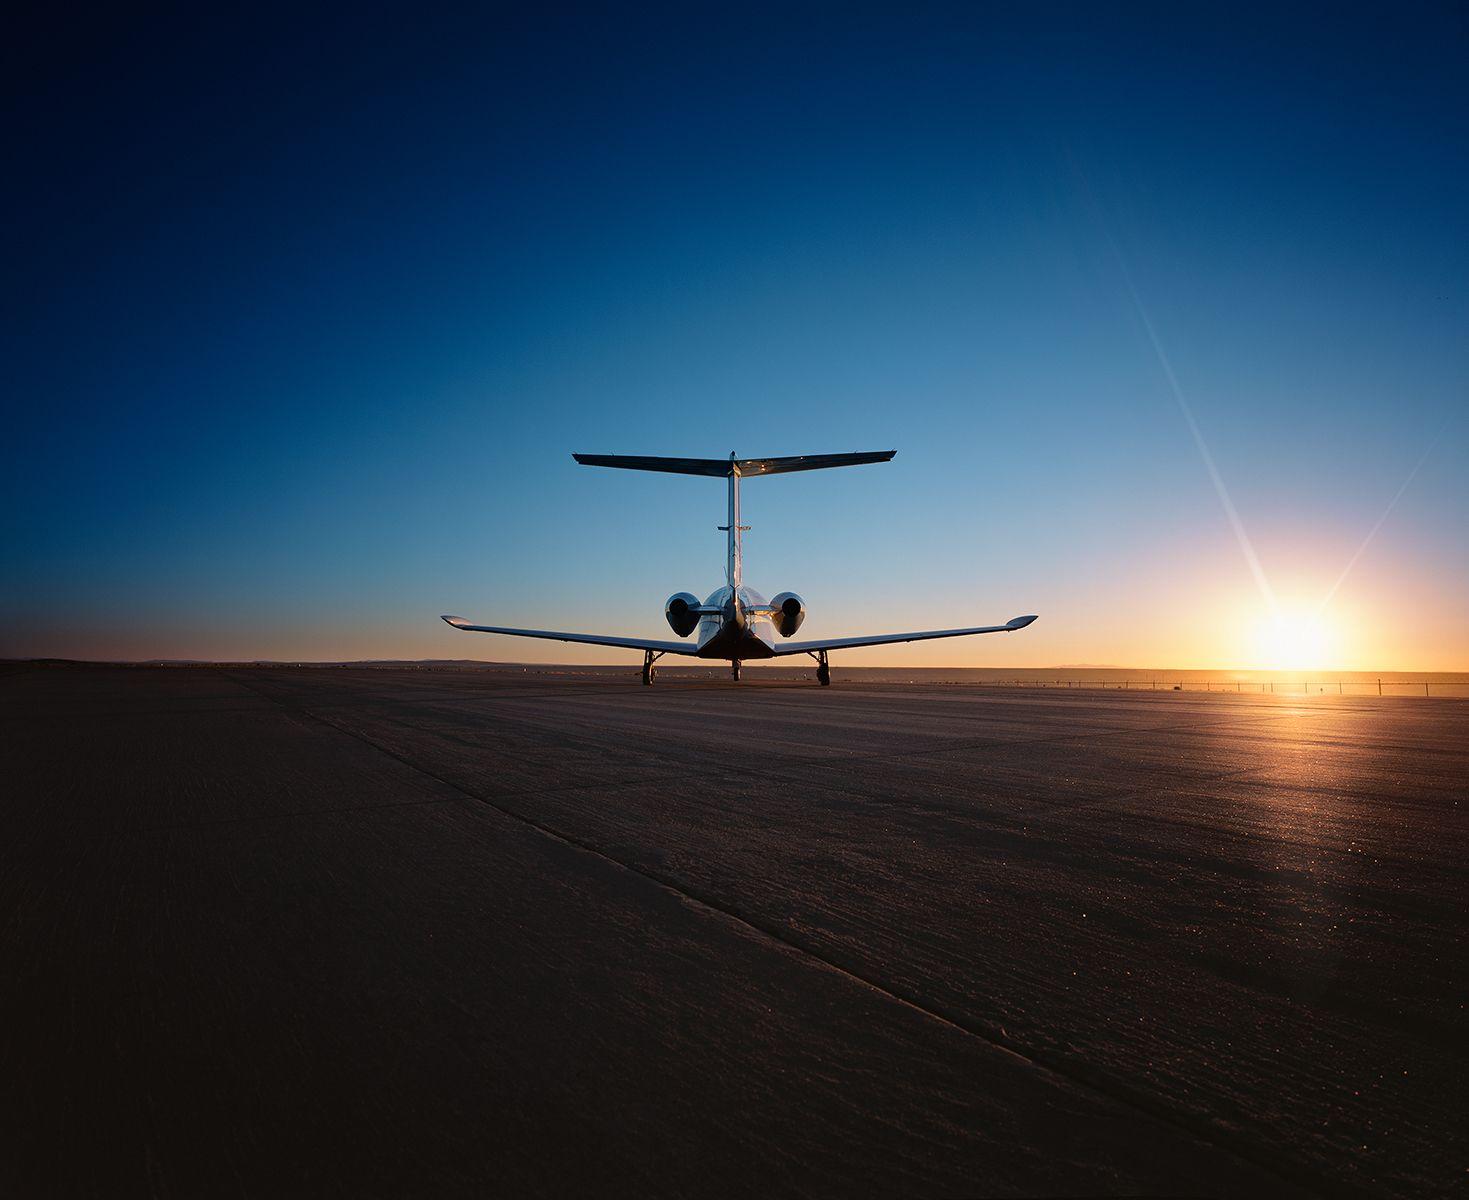 Eclipse 500 After Test Flight copy.jpg